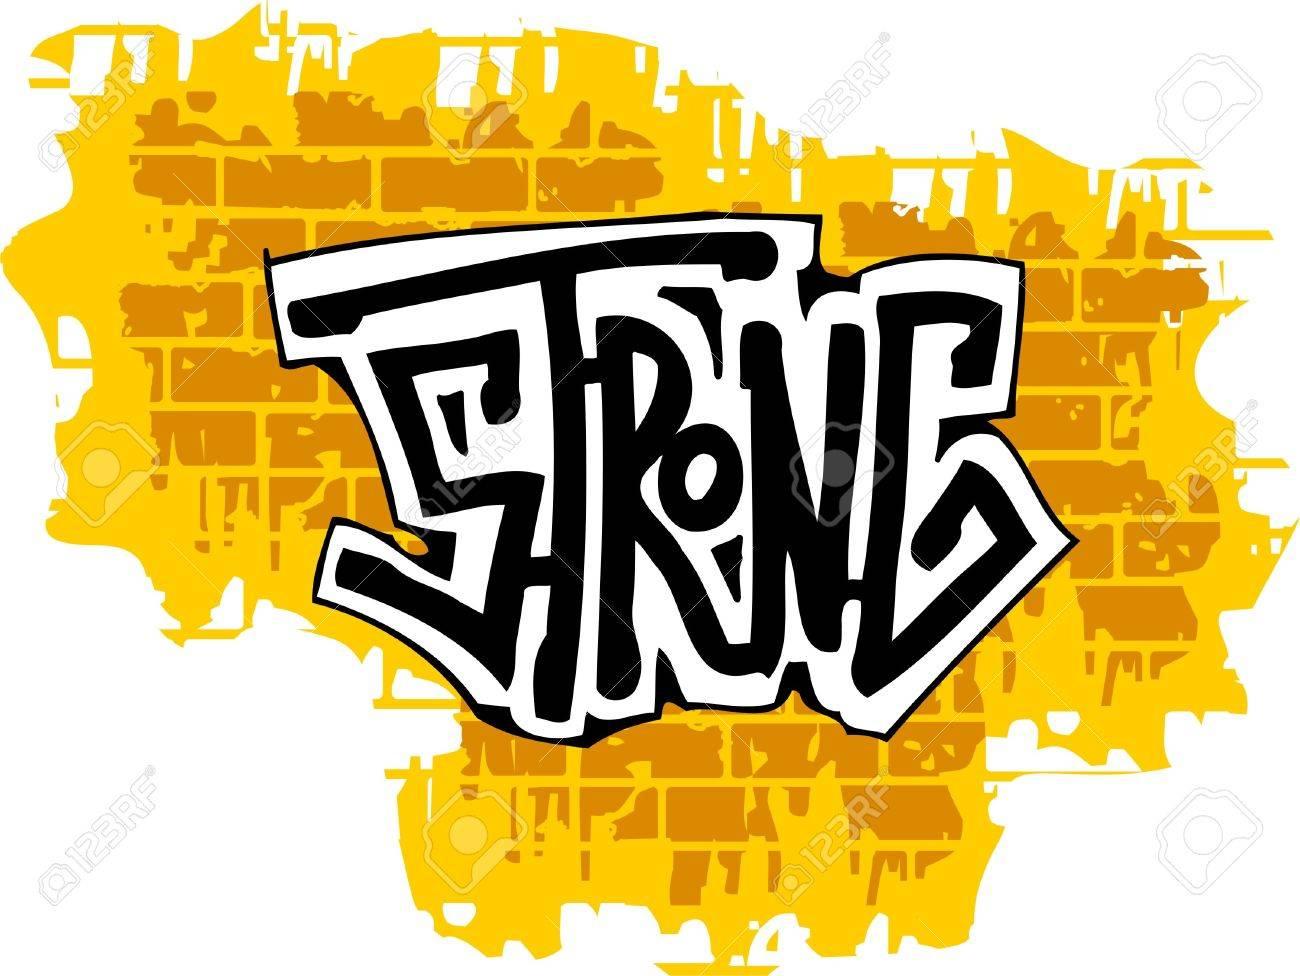 Graffiti wall clipart - Graffiti Brick Wall And Inscription Vector Illustration Vinyl Ready Stock Vector